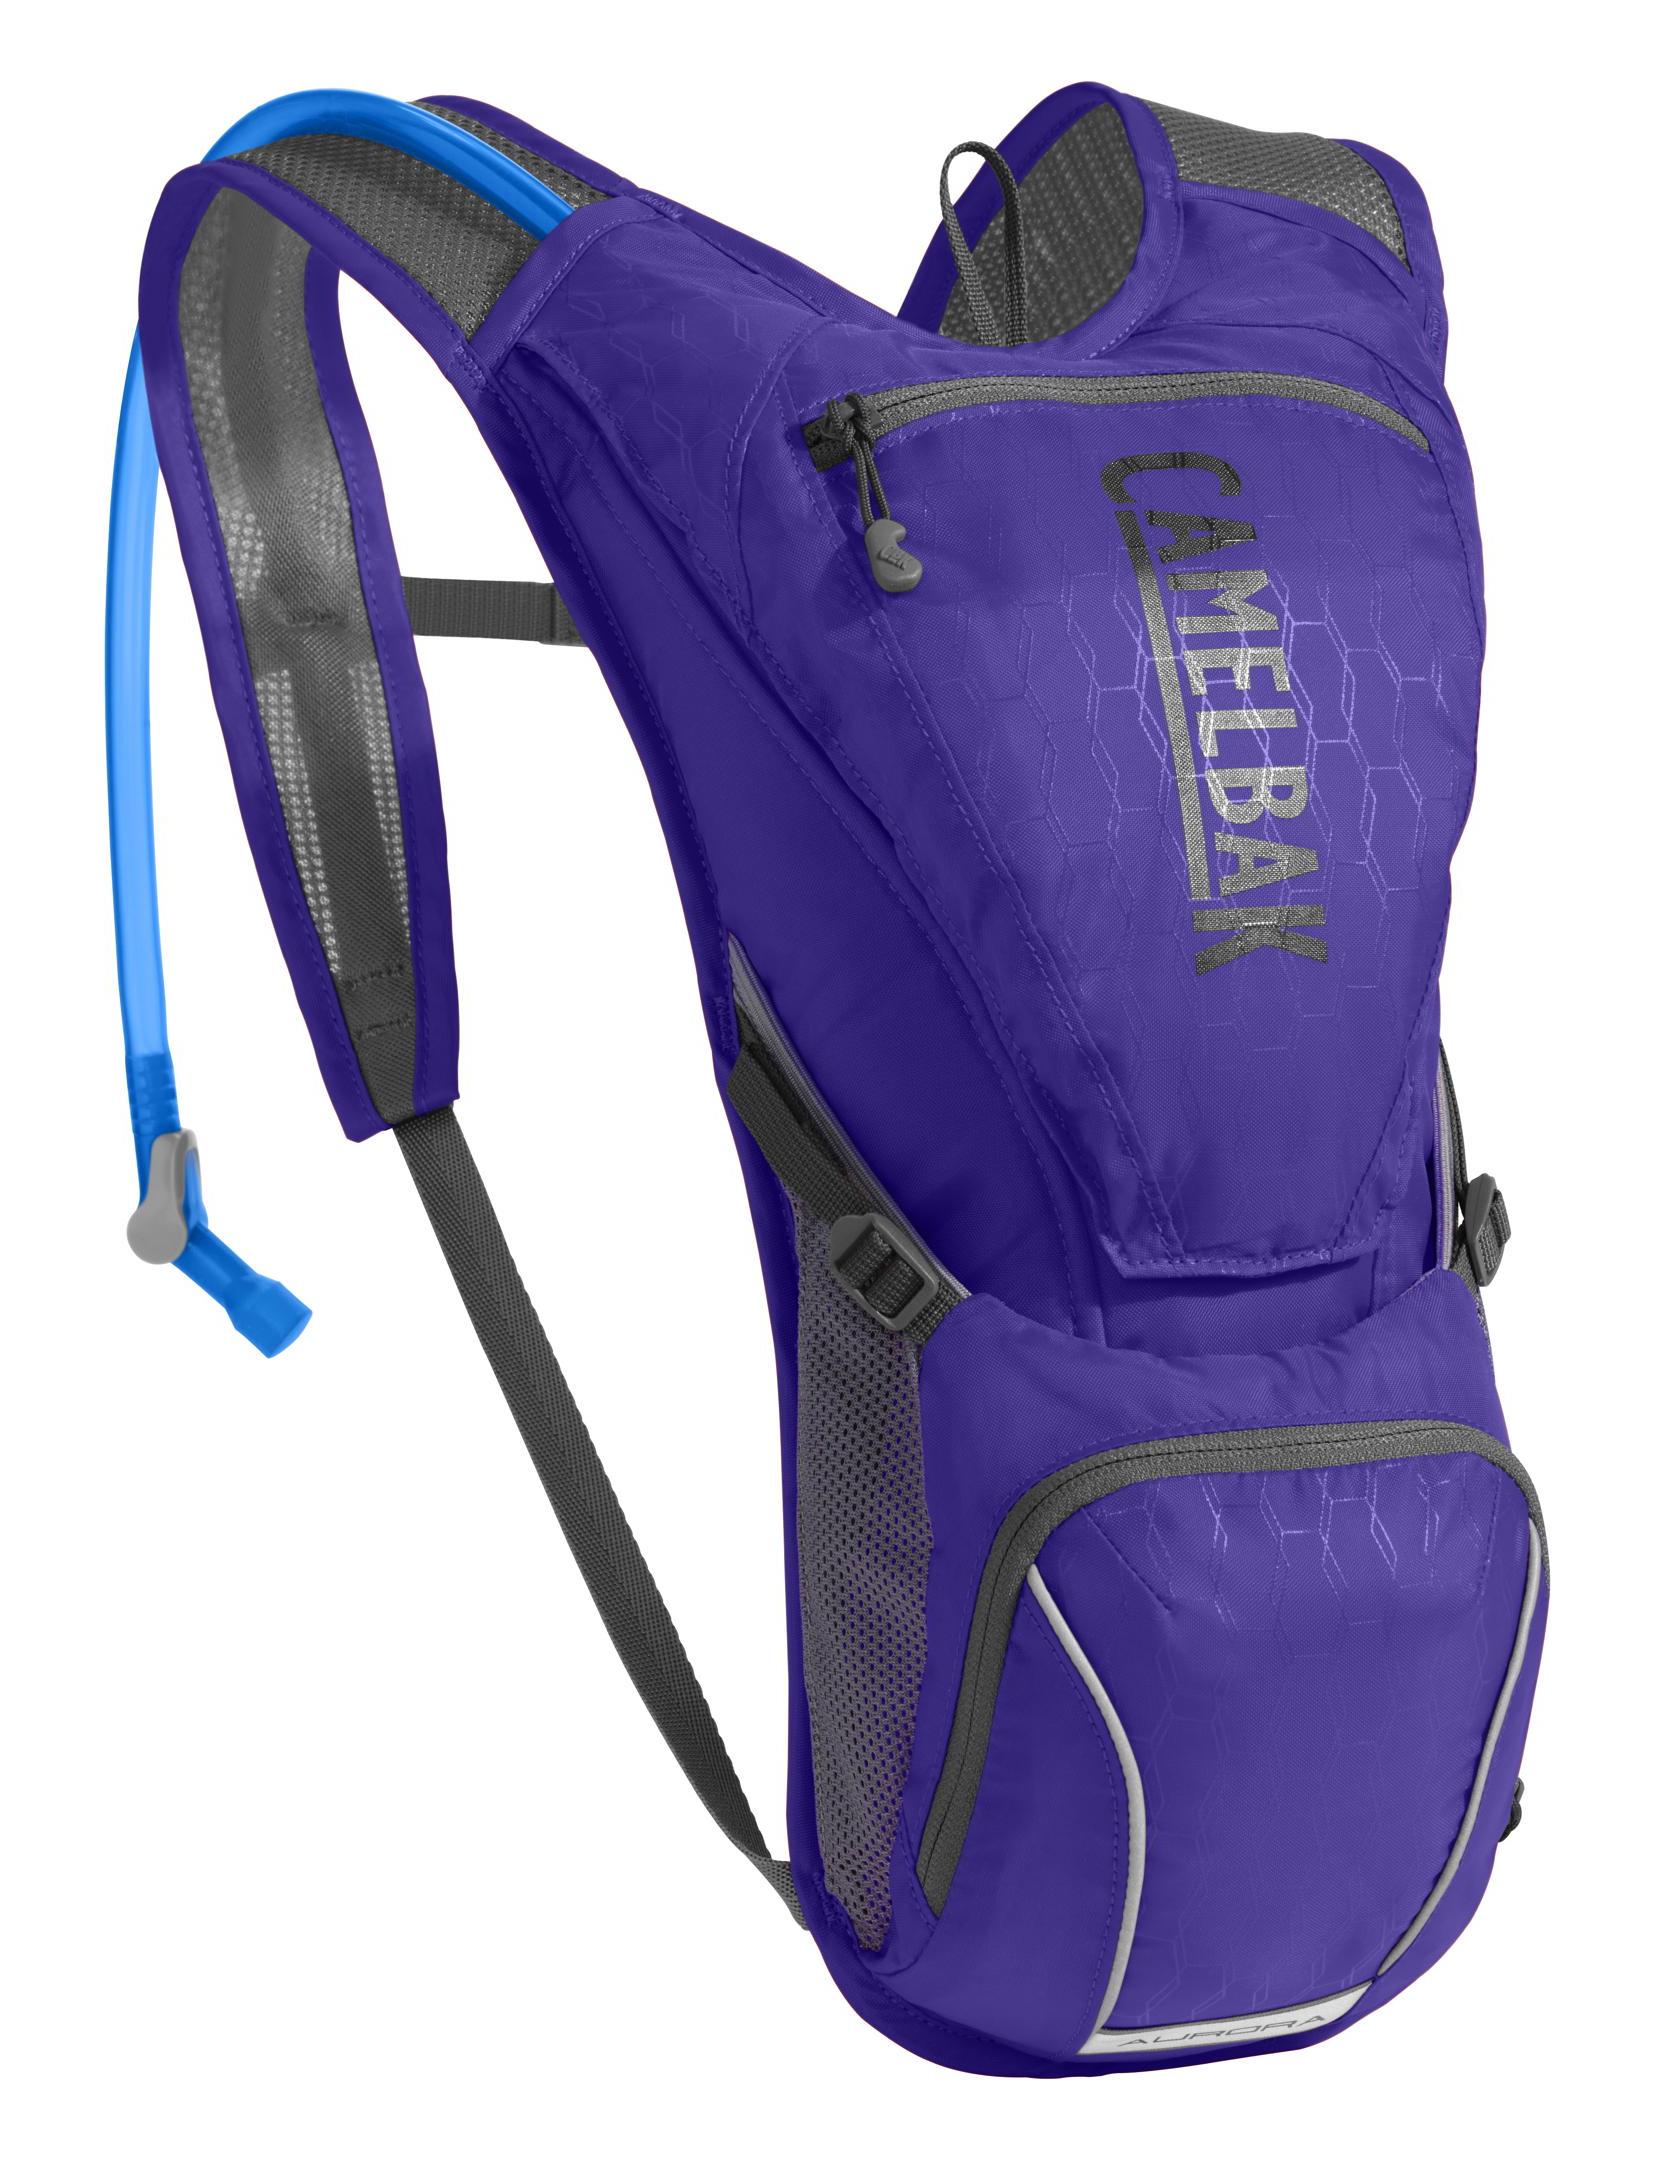 Camelbak Aurora Pack